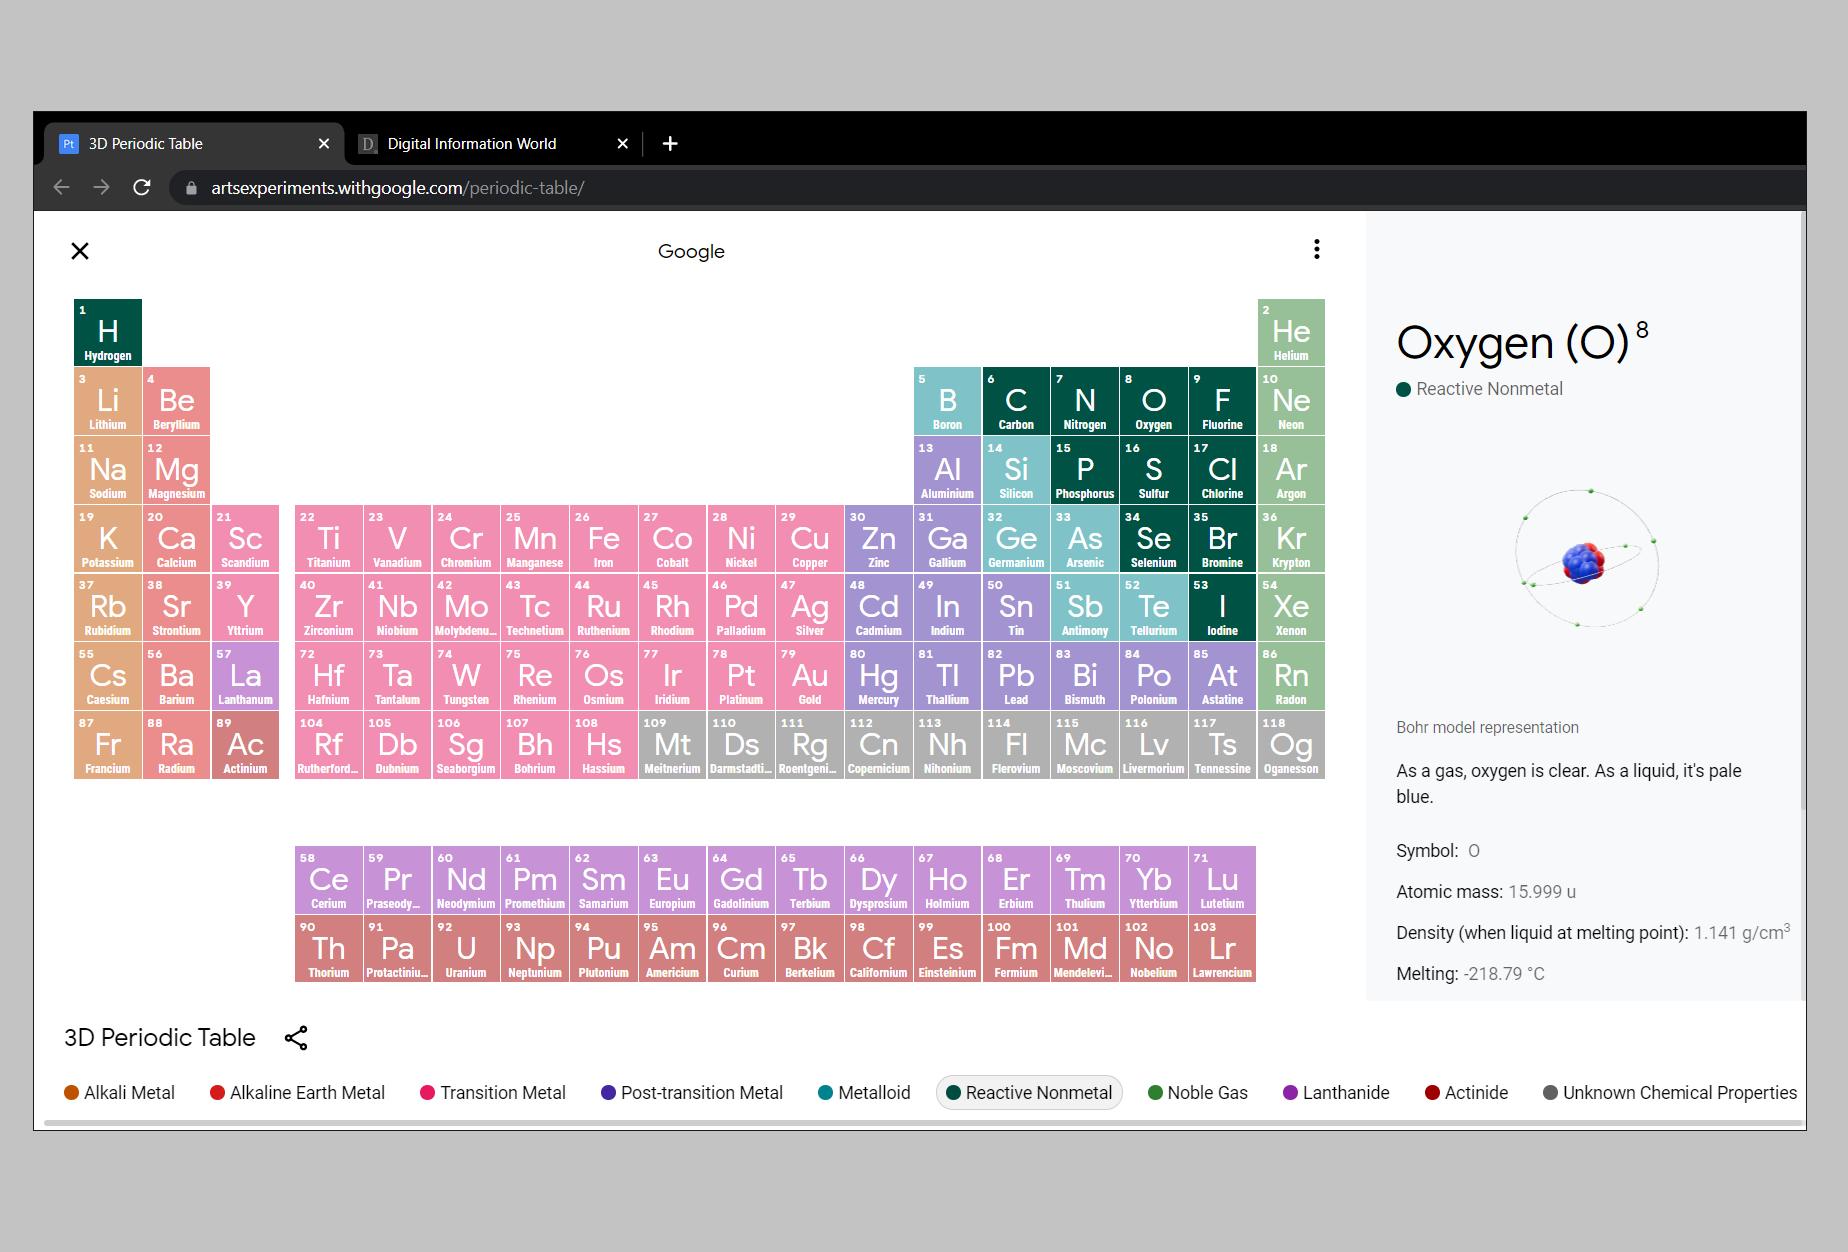 Google's periodic table